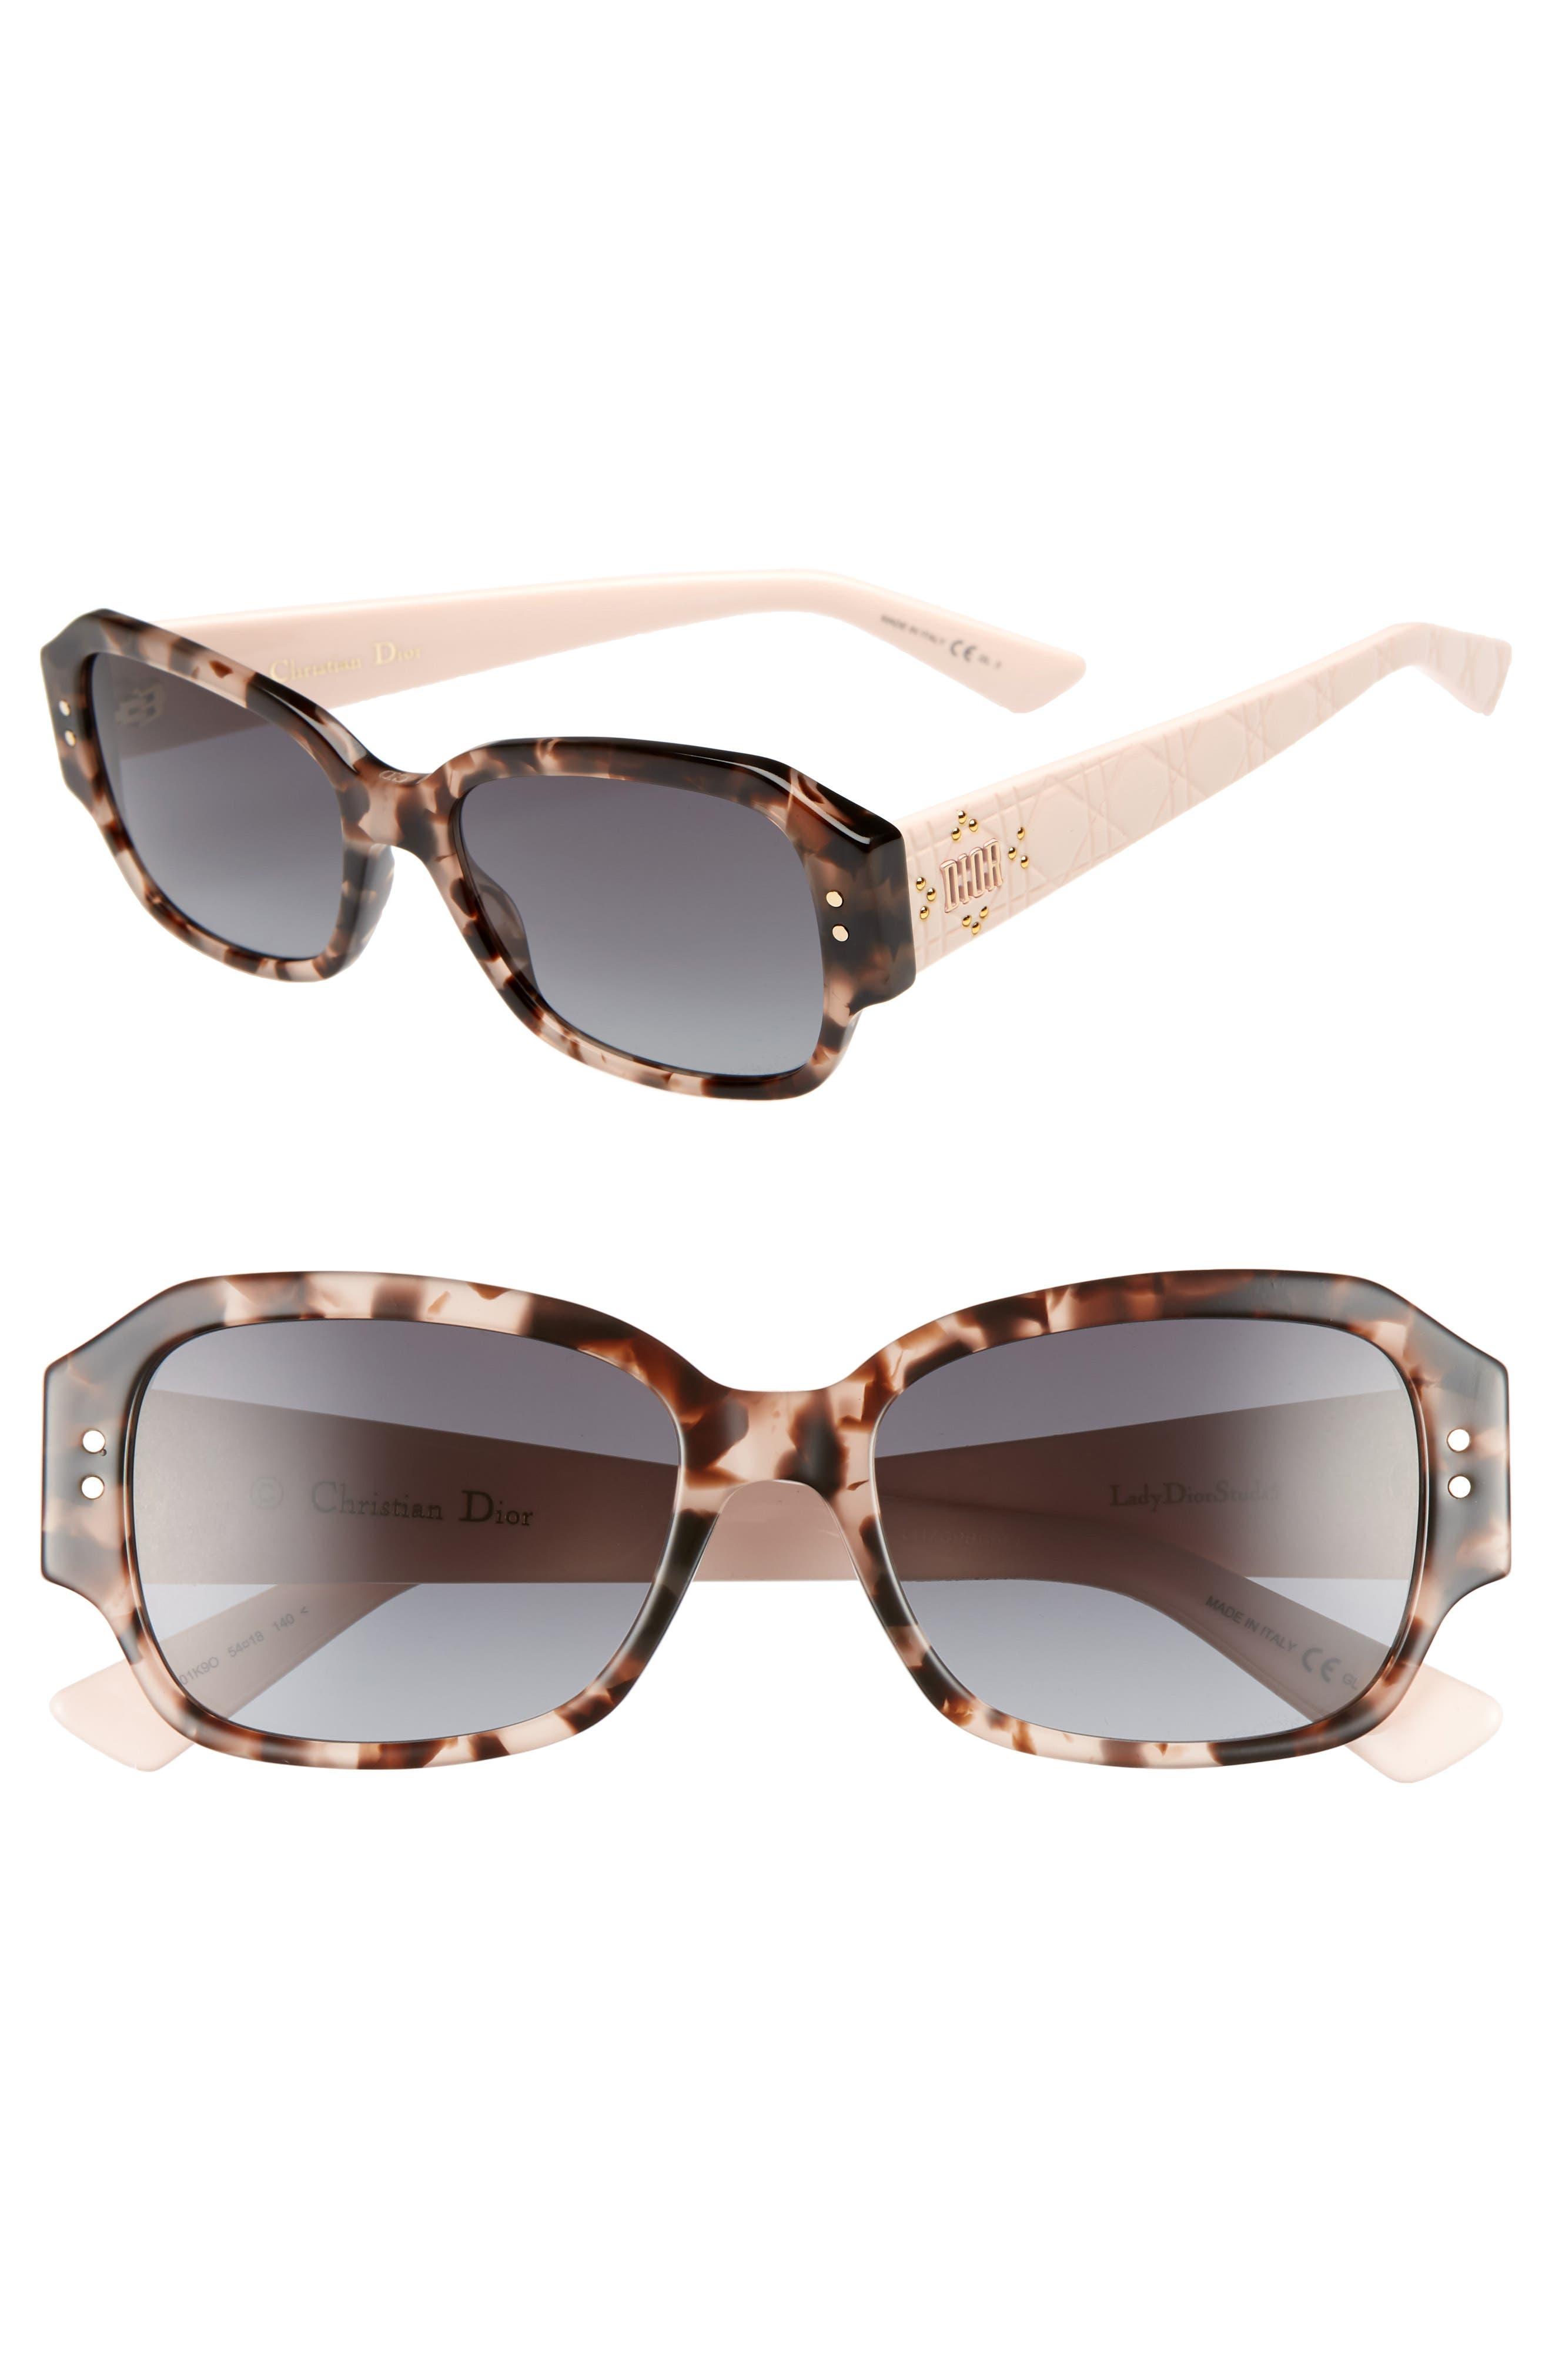 Image of Dior Stud 54mm Sunglasses